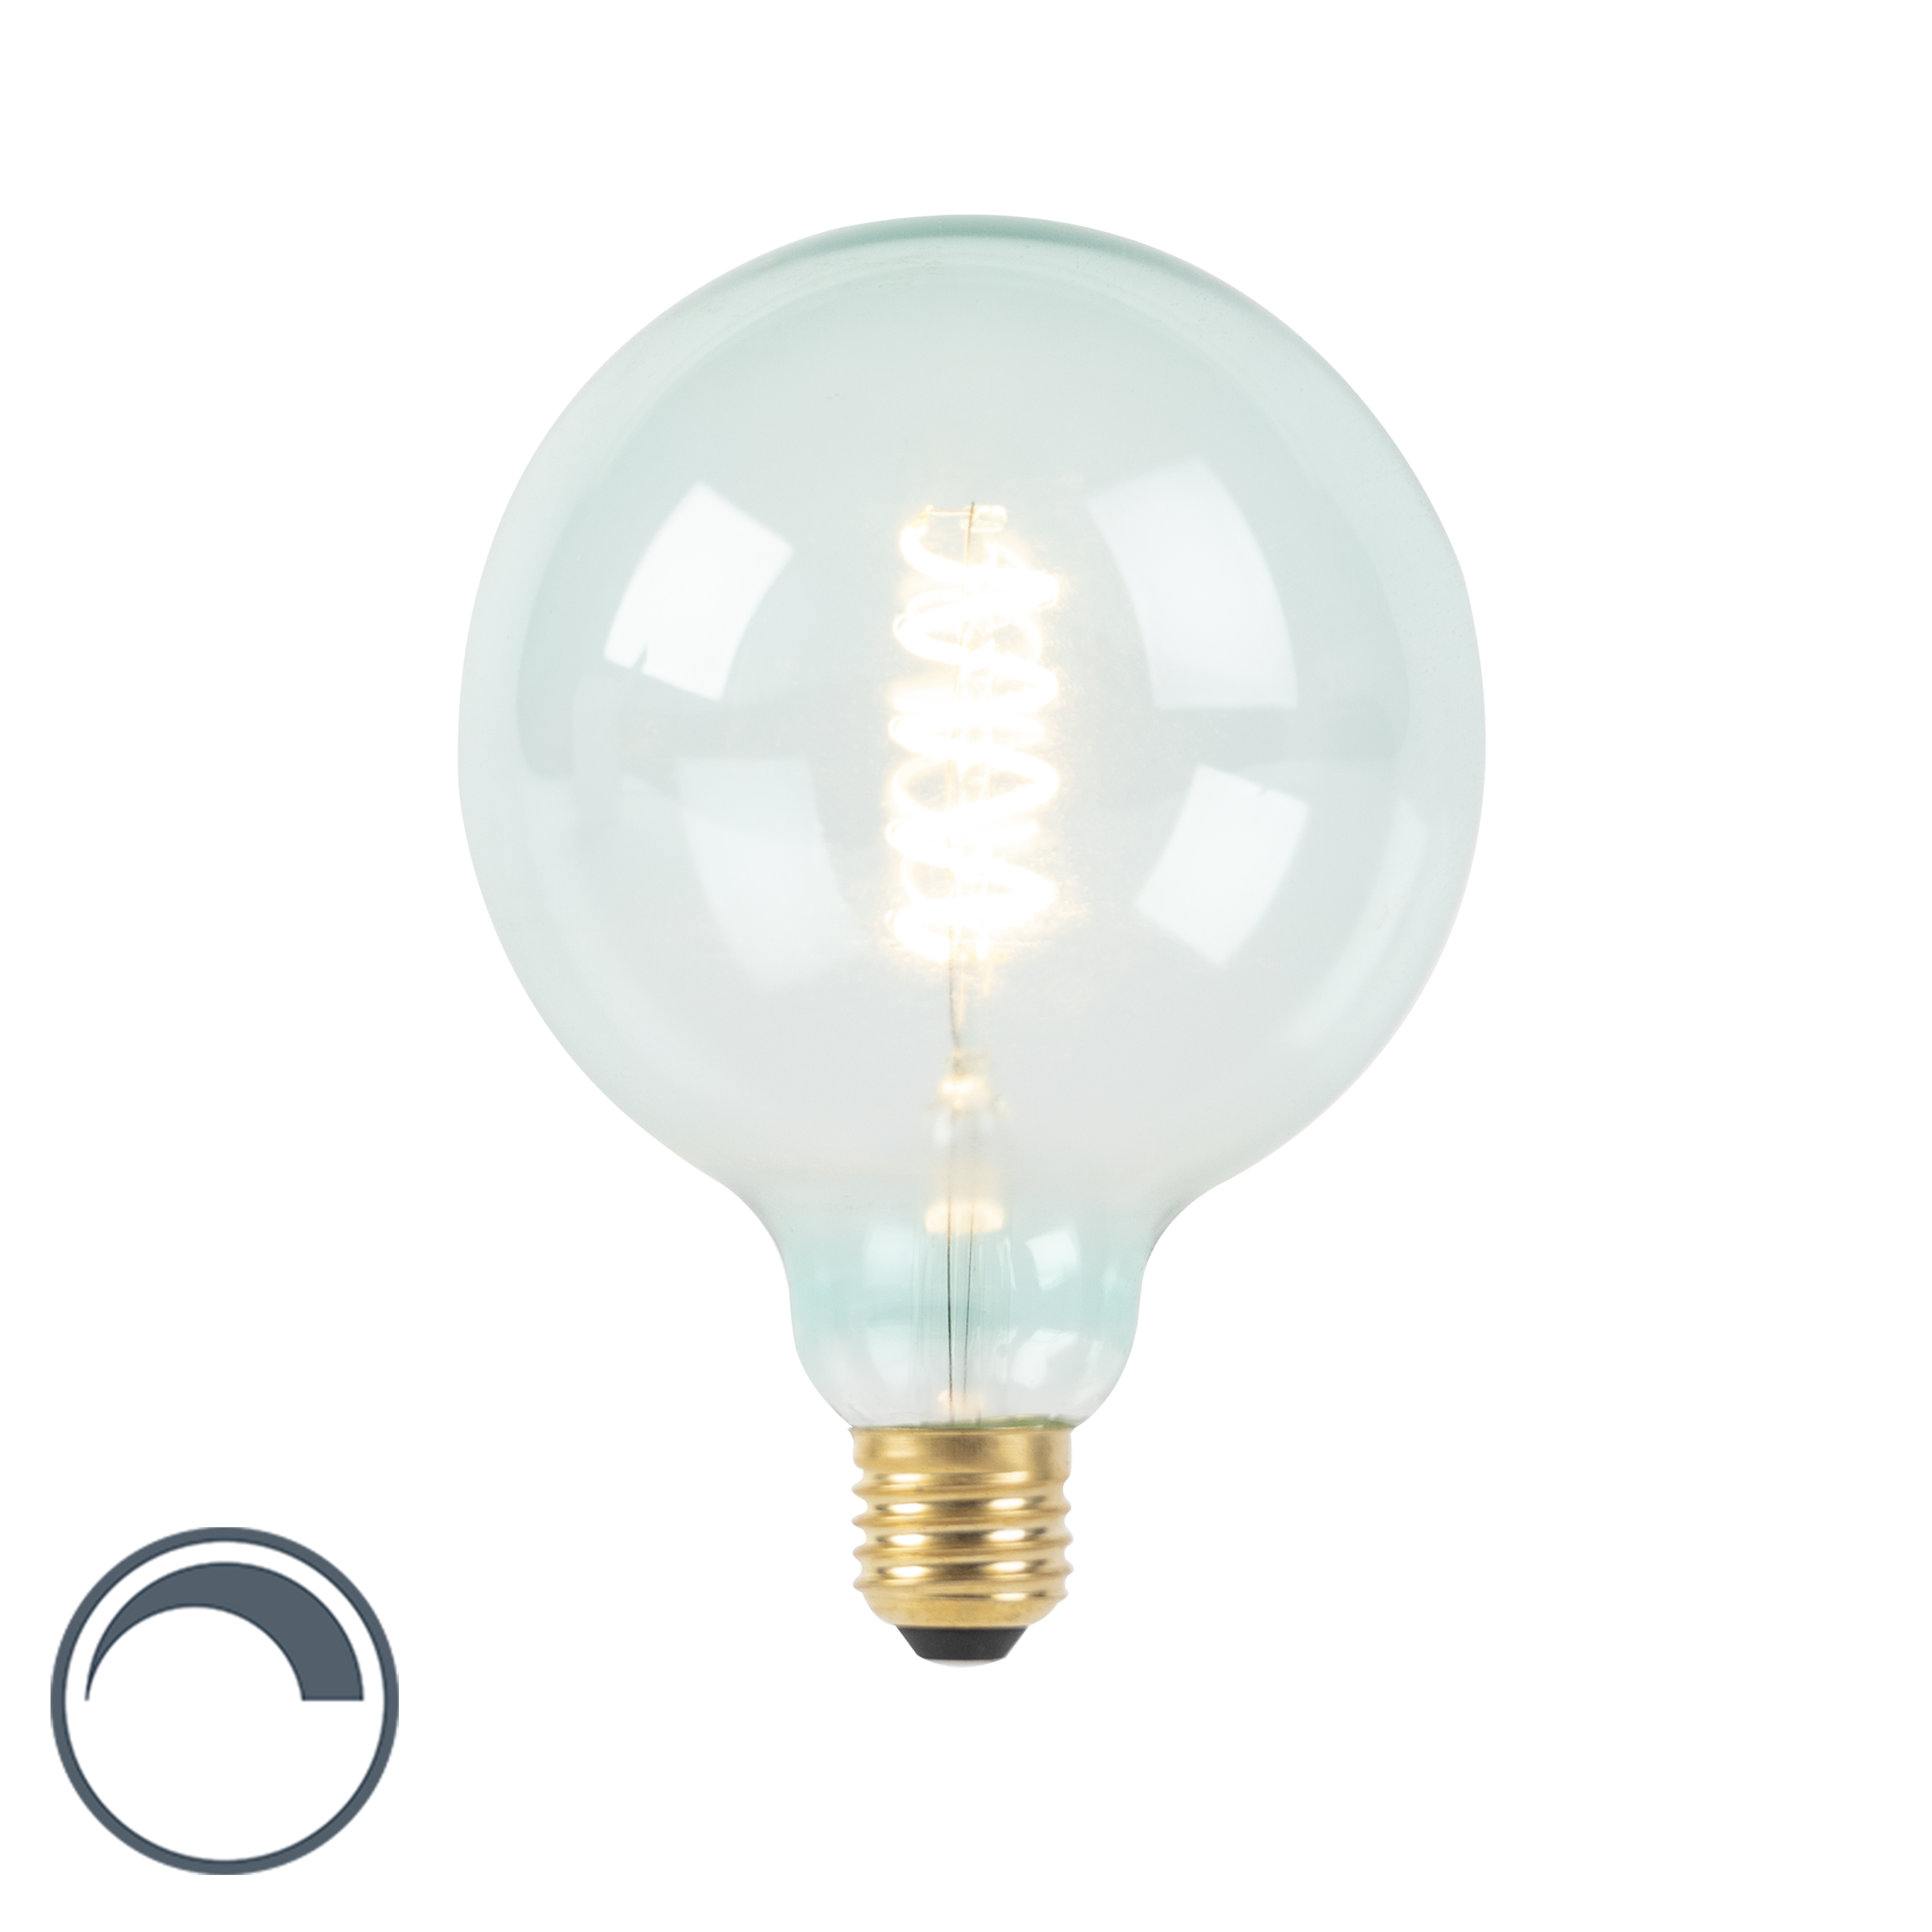 Żarówka LED E27 G125 spira filament niebieska 200lm 2100K ściemnialna